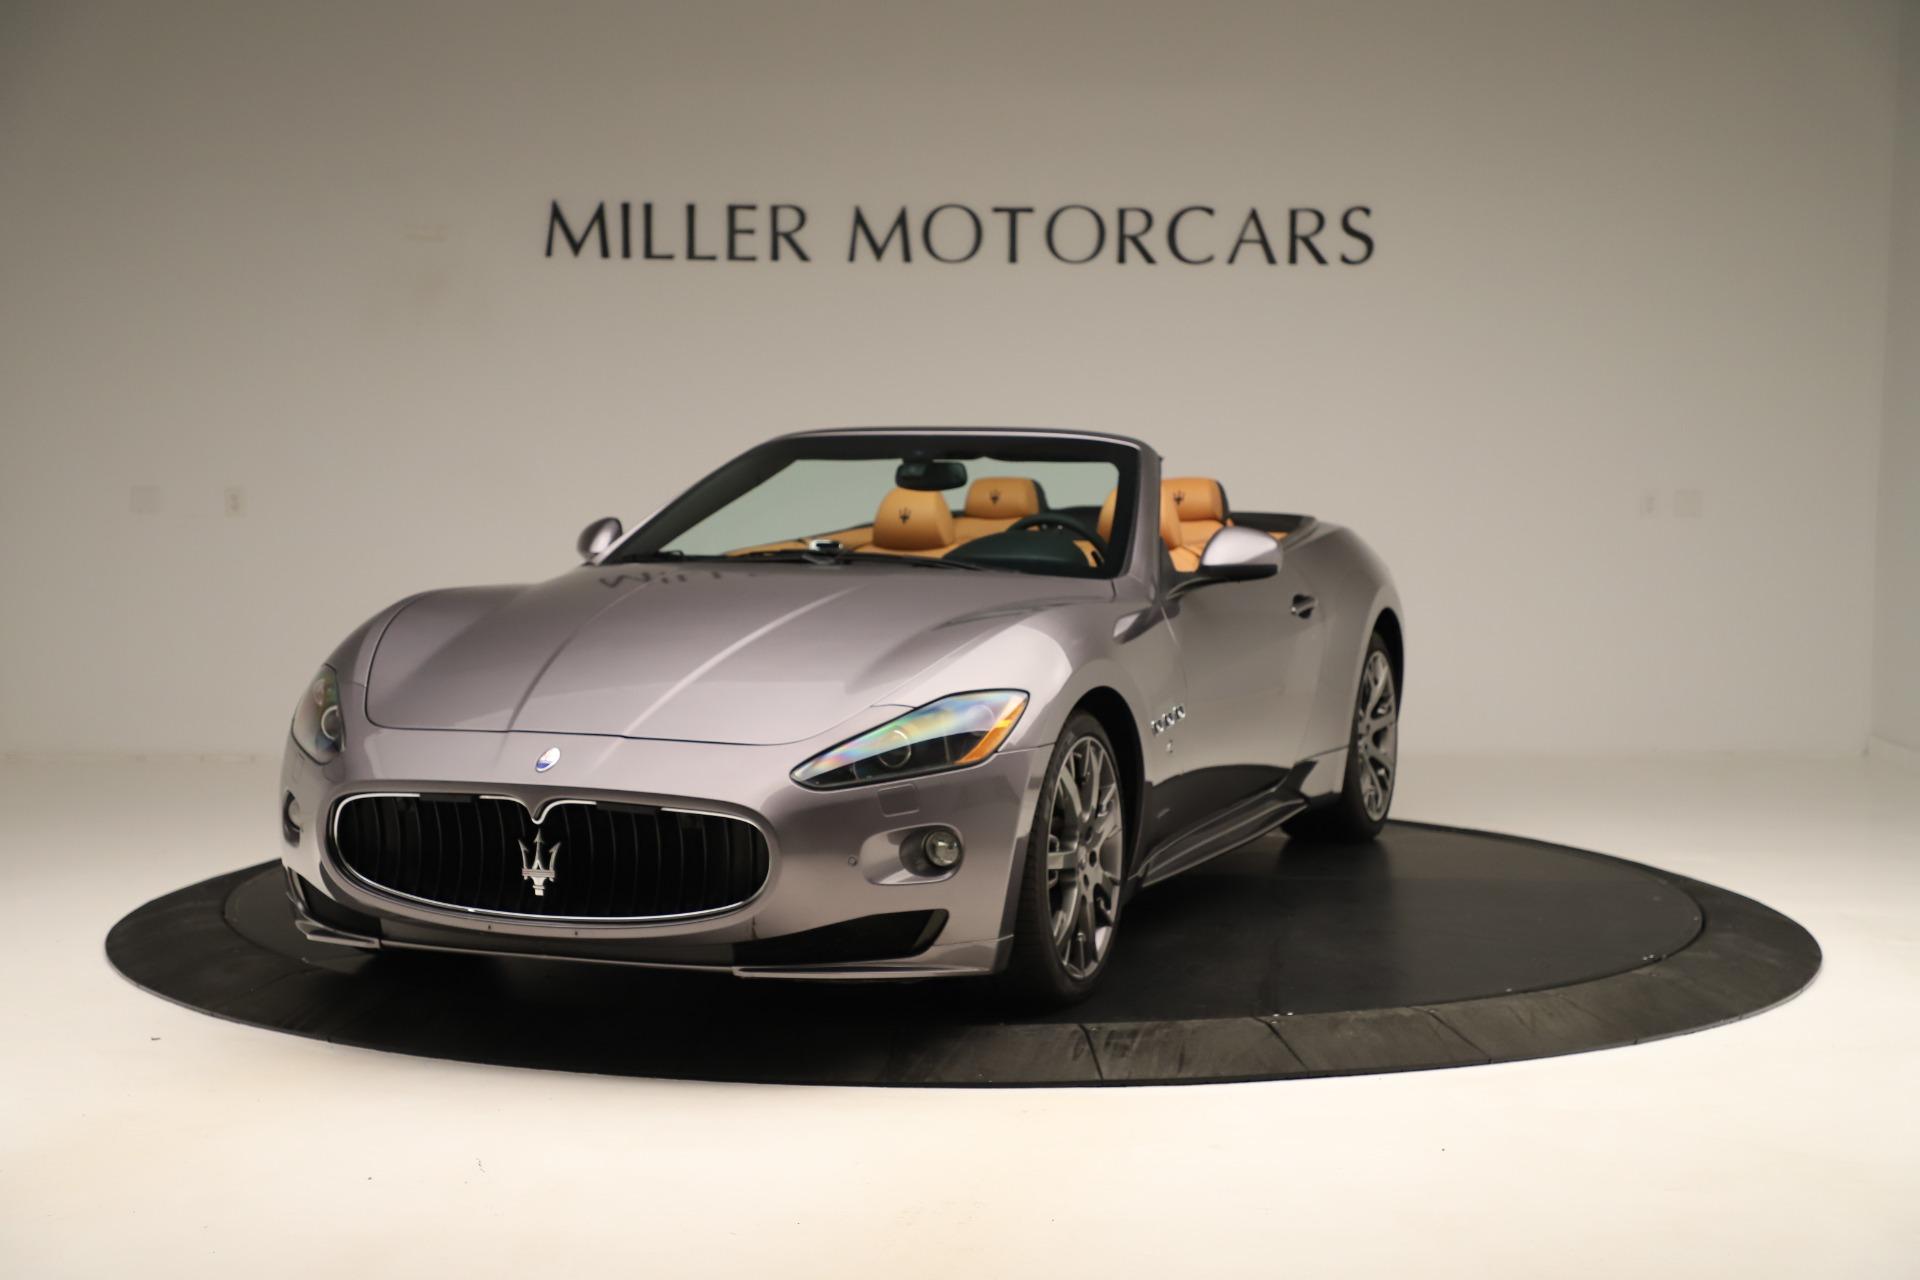 Used 2012 Maserati GranTurismo Sport for sale Sold at McLaren Greenwich in Greenwich CT 06830 1